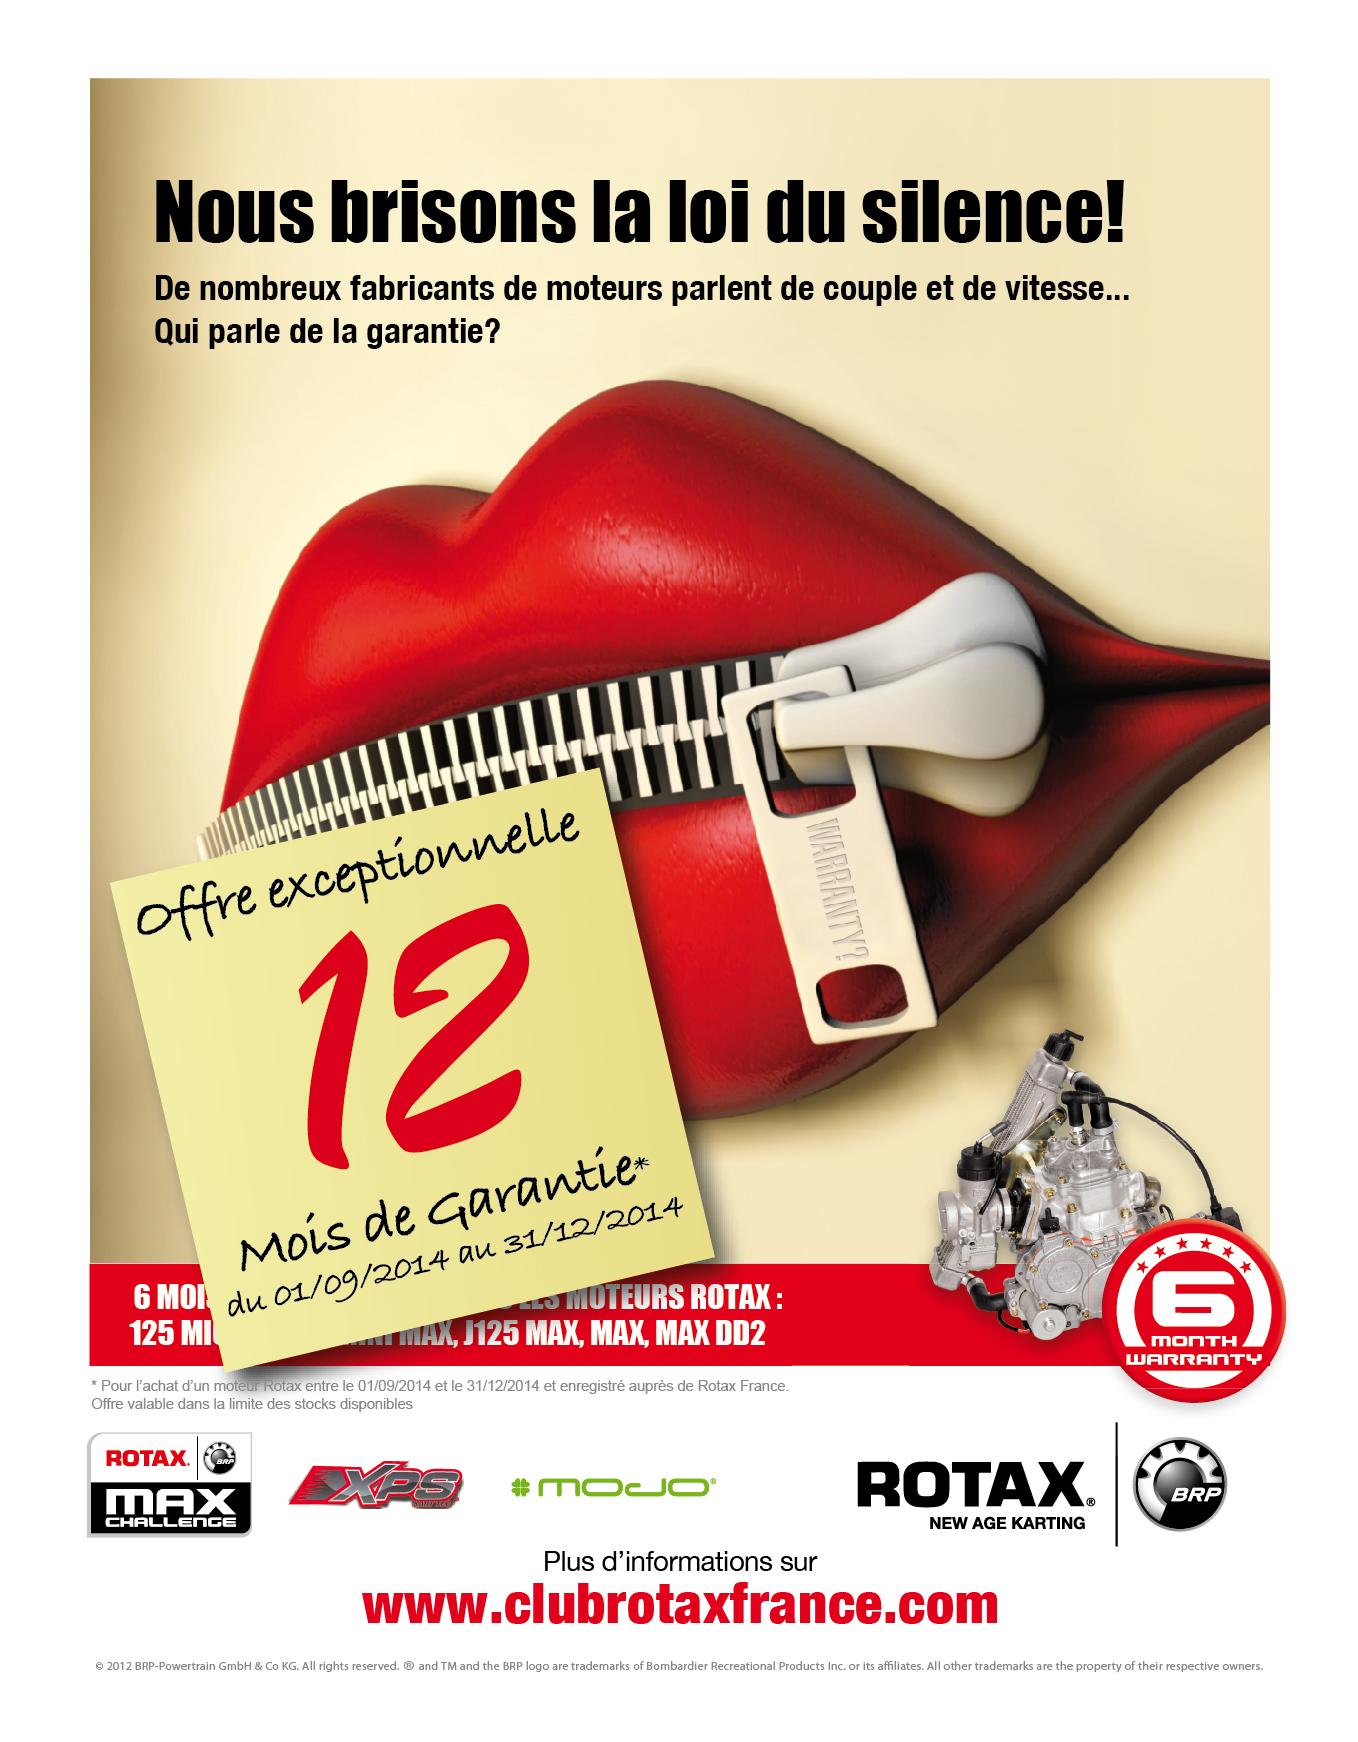 ROTAX : Extension de garantie à 12 mois